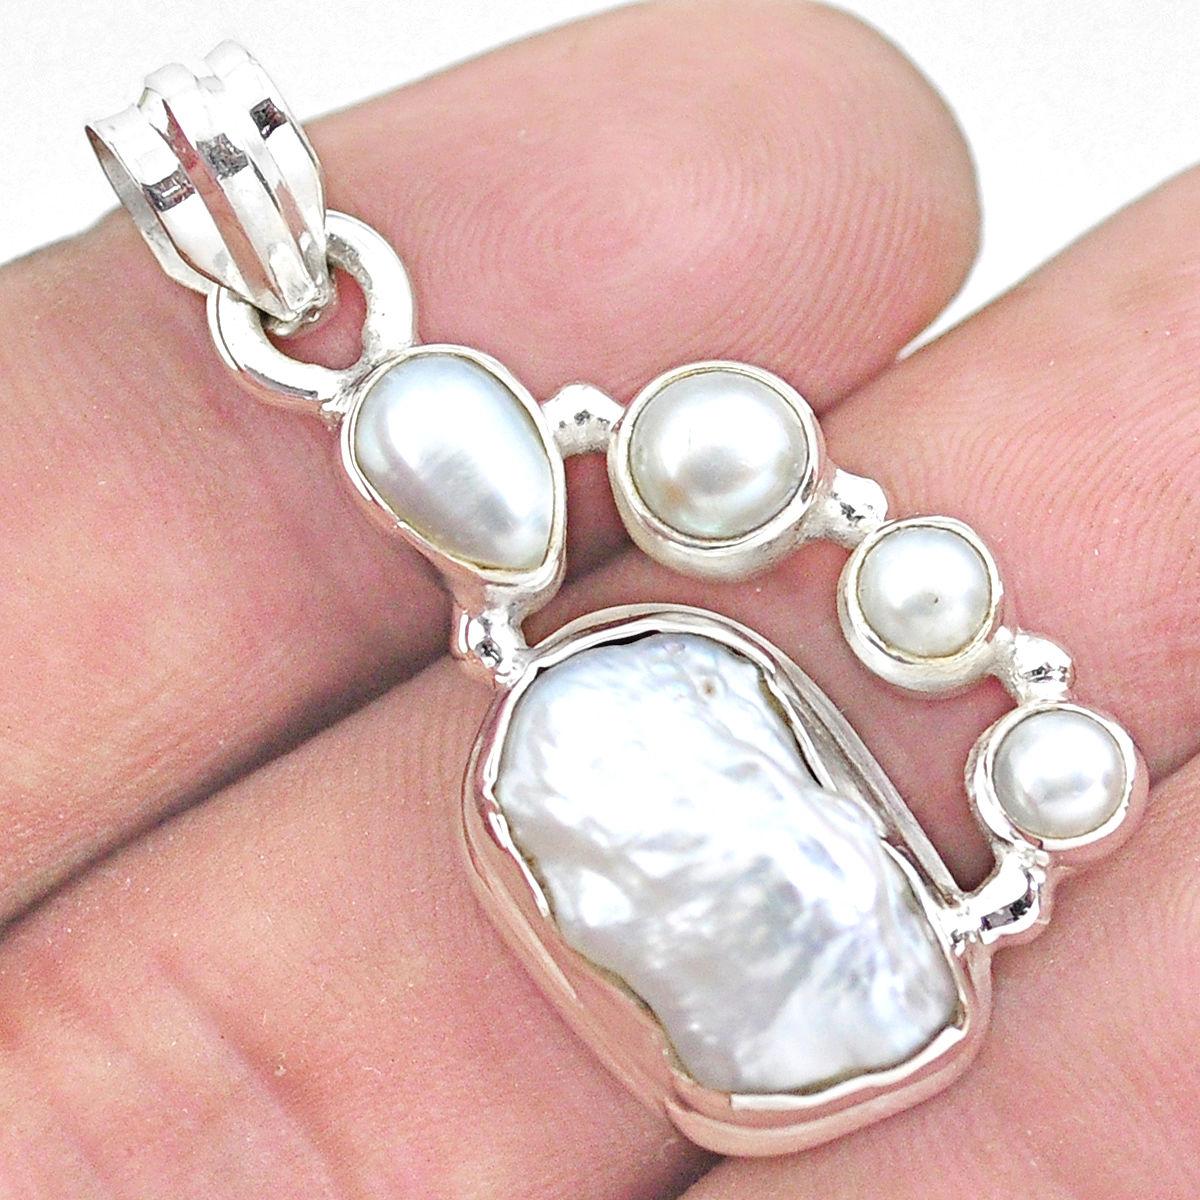 1 316 White Abalone Shell Biwa Pearl 925 Sterling Silver Pendant